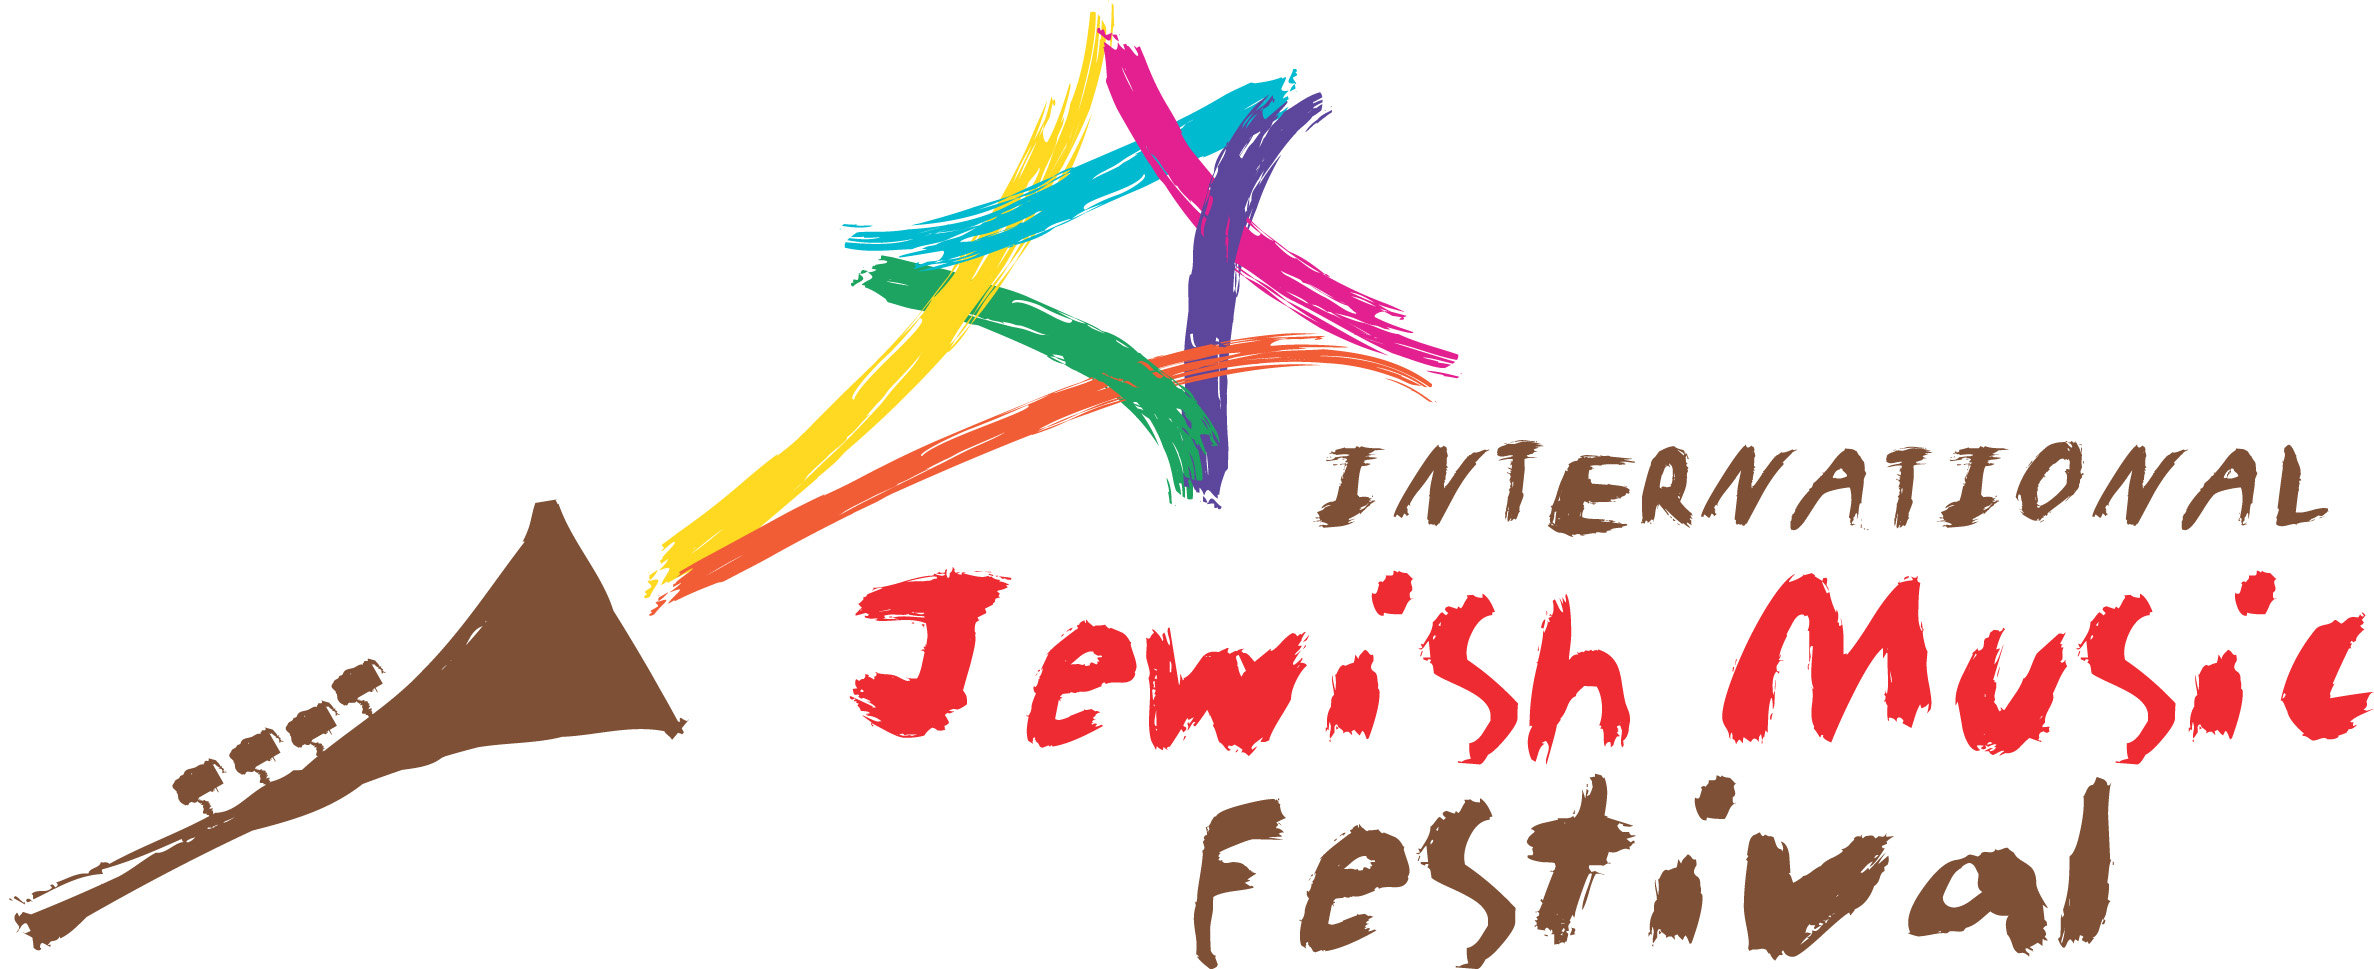 Hasil gambar untuk JEWISH MUSIC FESTIVAL